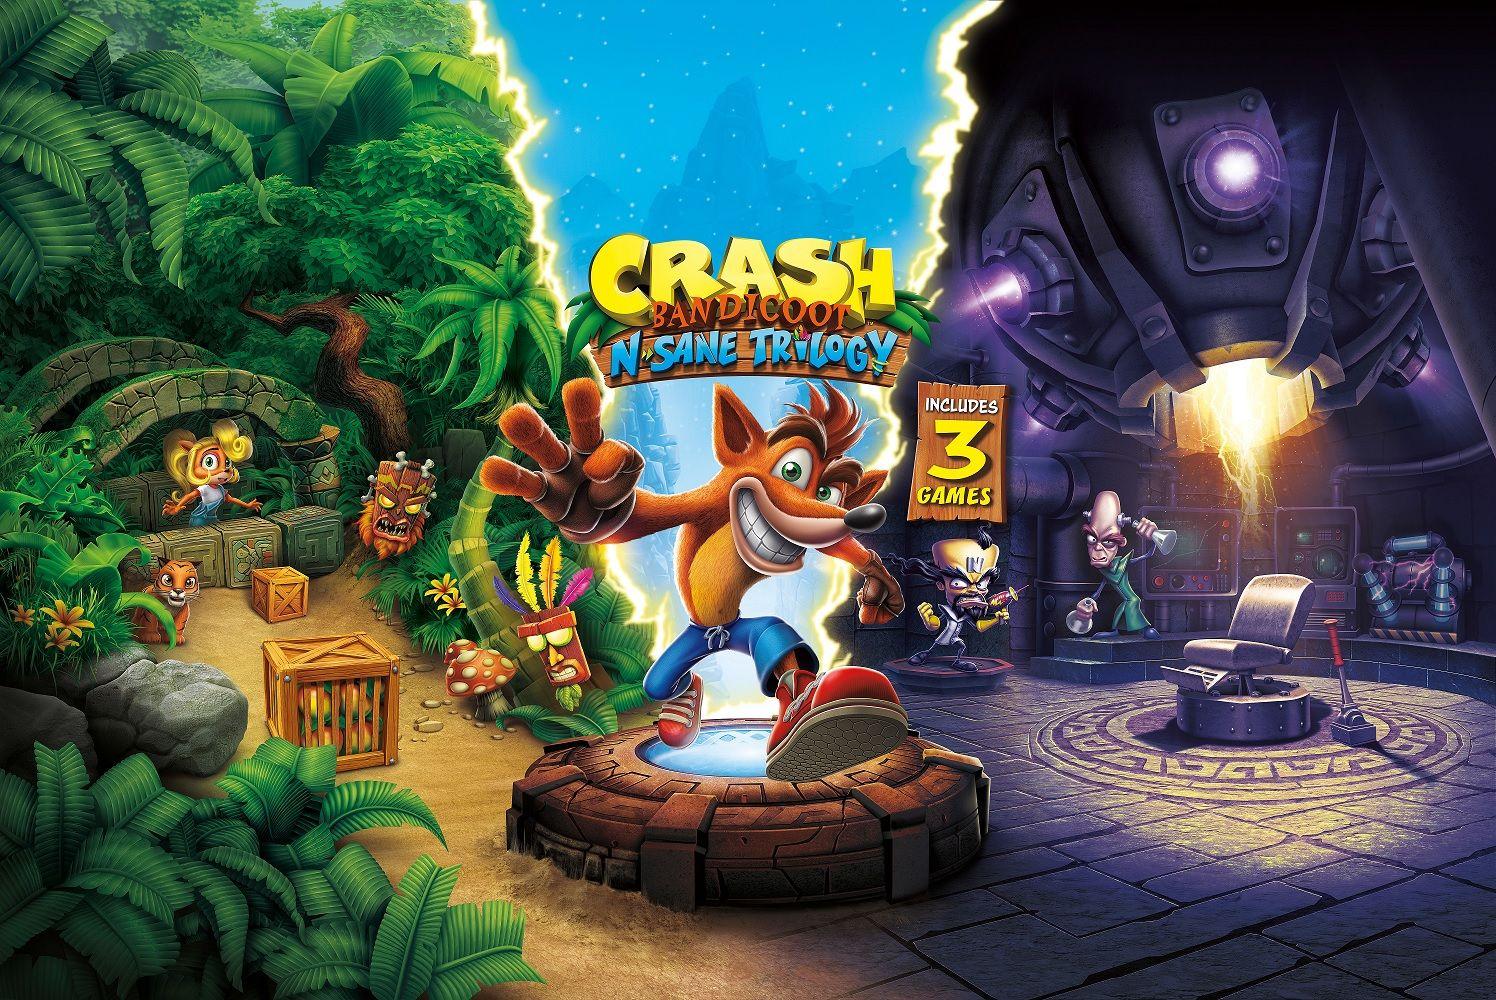 Crash Bandicoot N Sane Trilogy Art Crash Bandicoot Bandicoot Crash